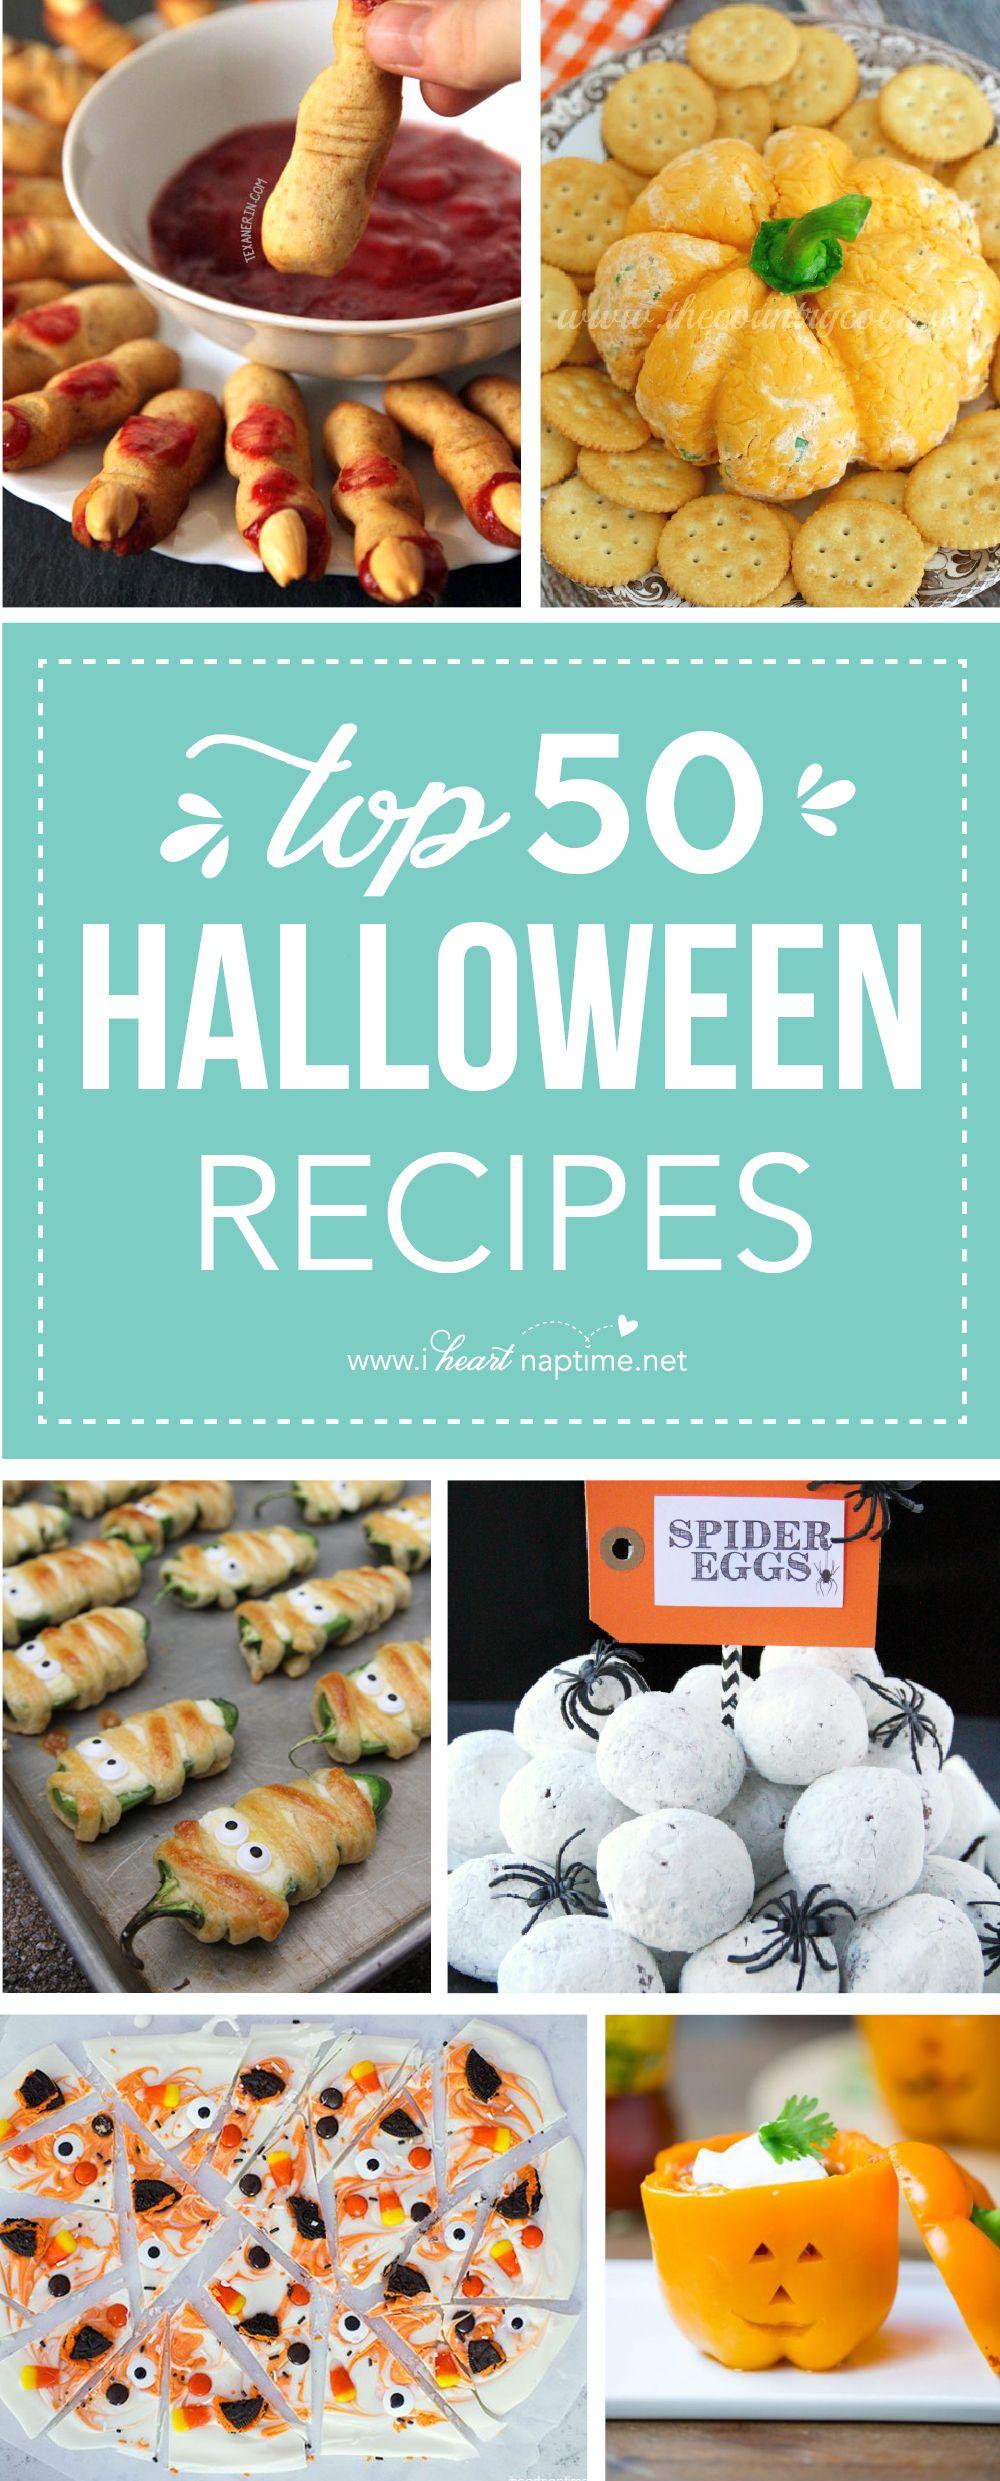 Top 50 Halloween Recipes Halloween dishes, Halloween